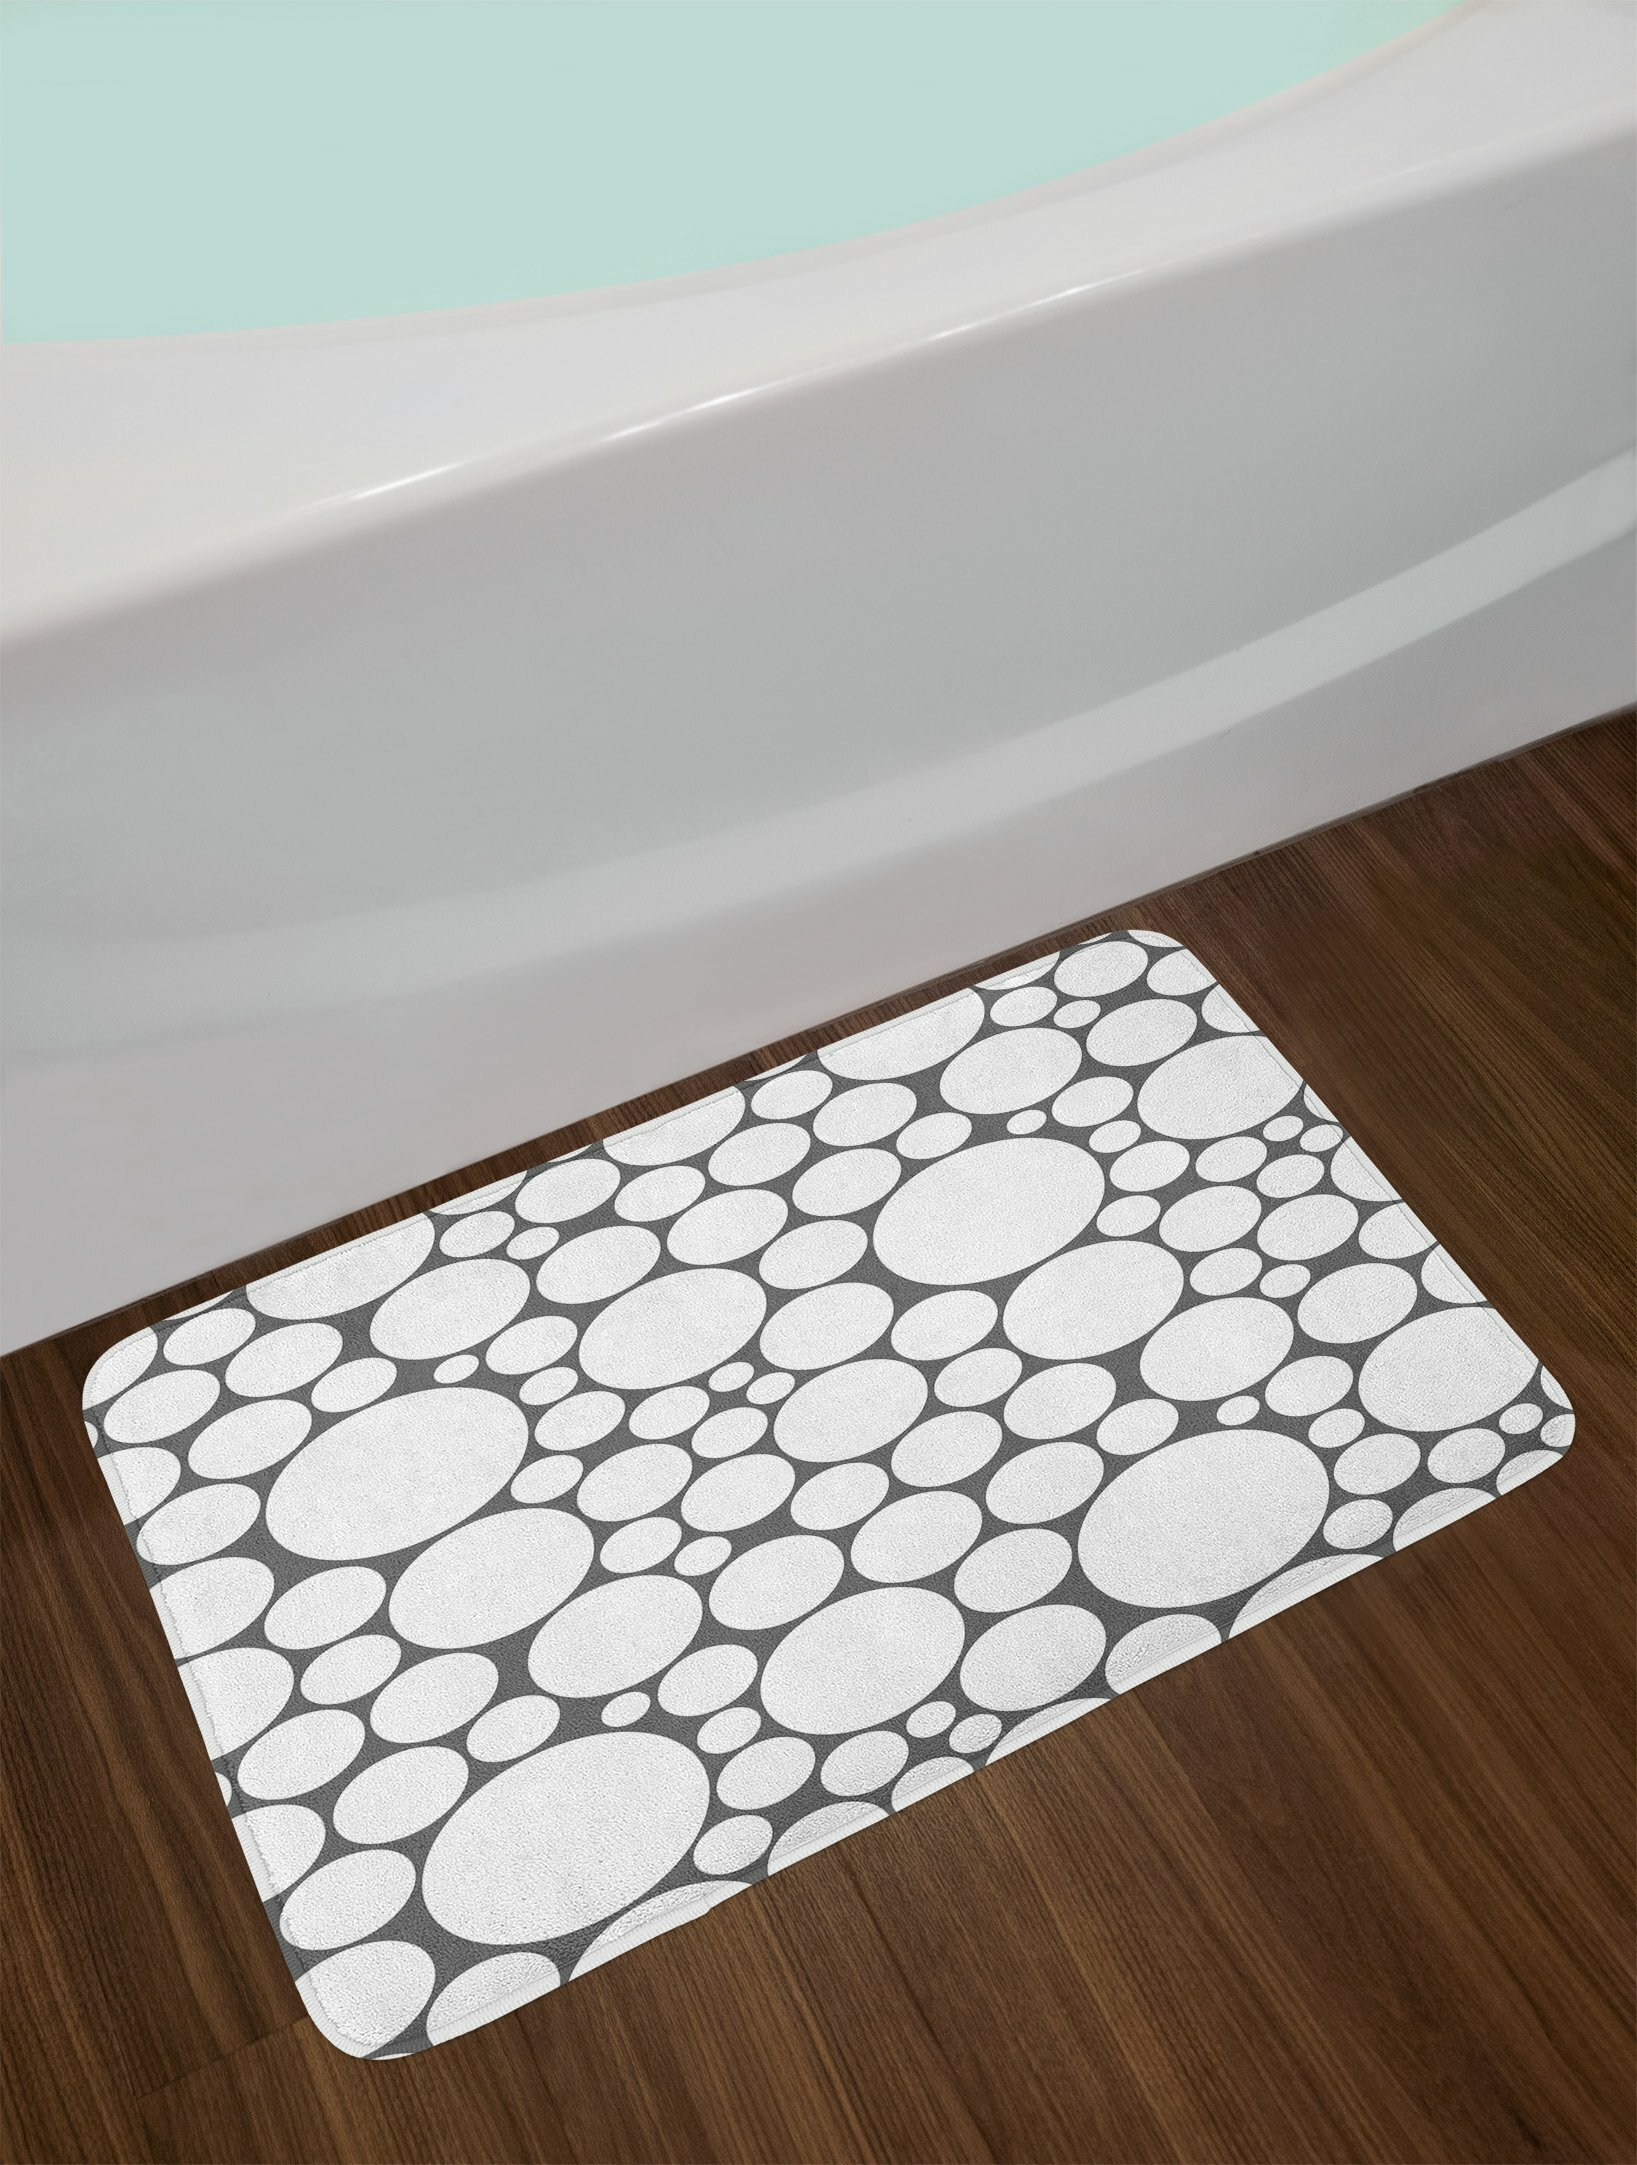 East Urban Home Geometric Retro Pattern with Large Small Round Dots Bath Rug   Wayfair